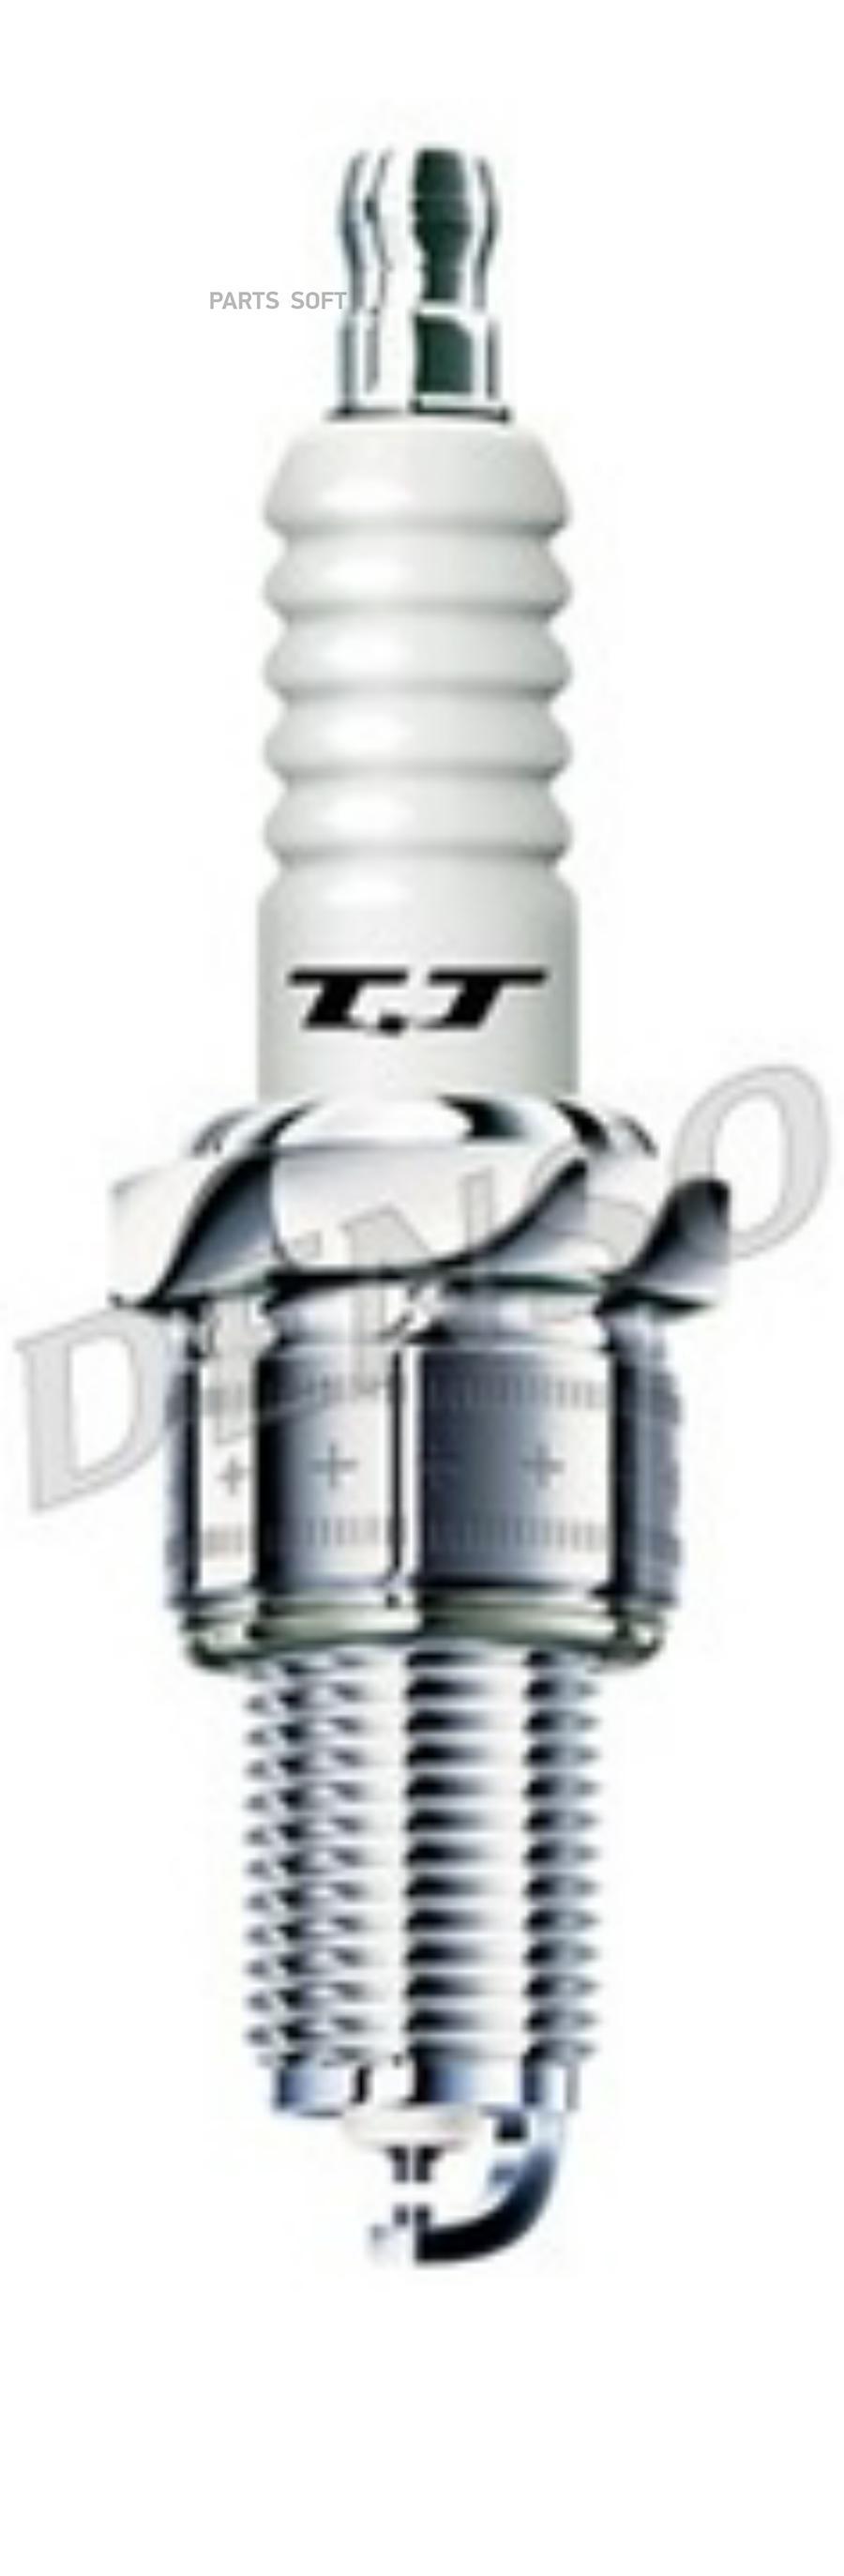 Свеча зажигания Audi/BMW/Daewoo/Fiat/Honda/Hyundai/Kia/Mazda/Mitsubishi/Nissan/Opel/Renault/Subaru/S